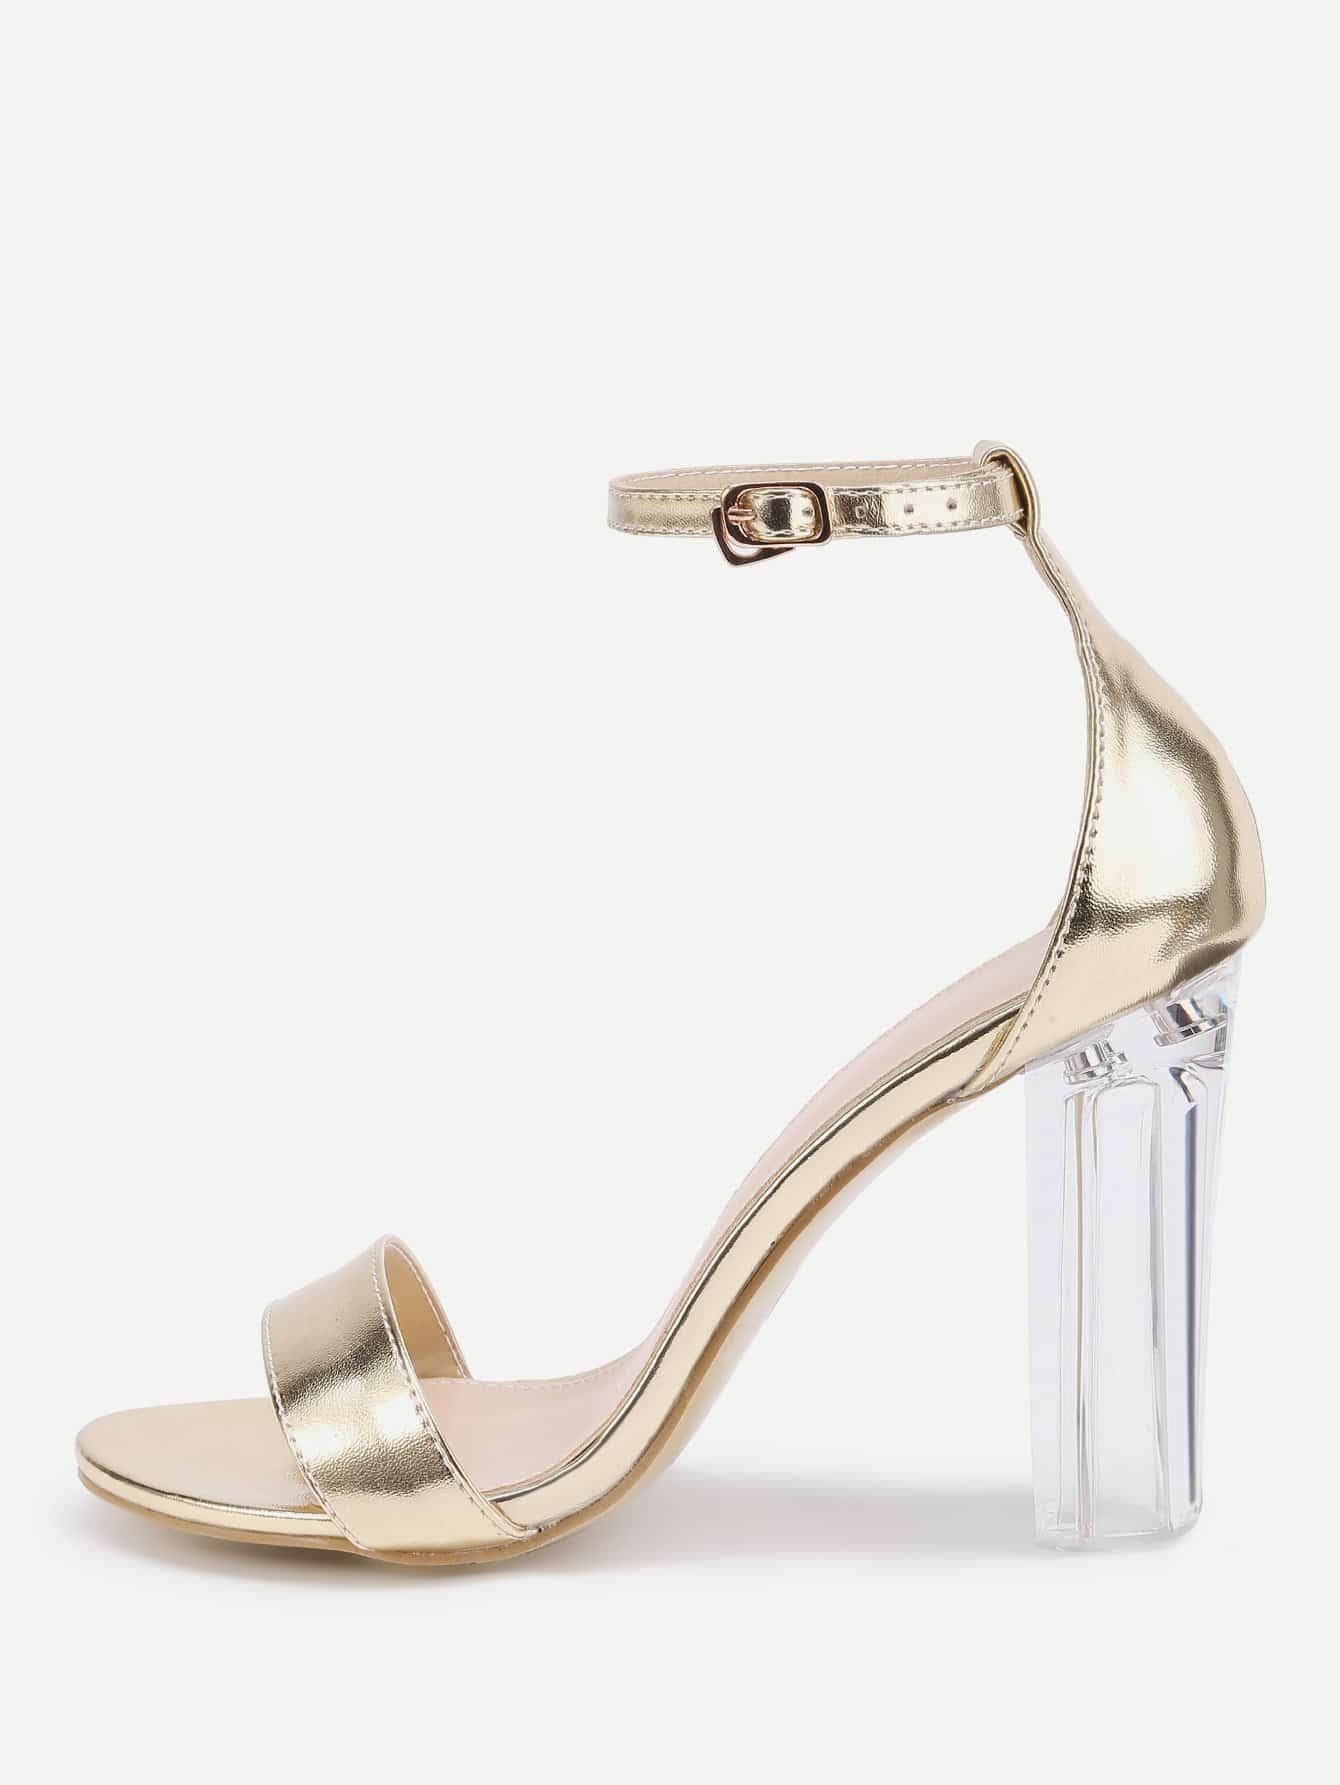 Lucite Heel Sandals shoes170404812